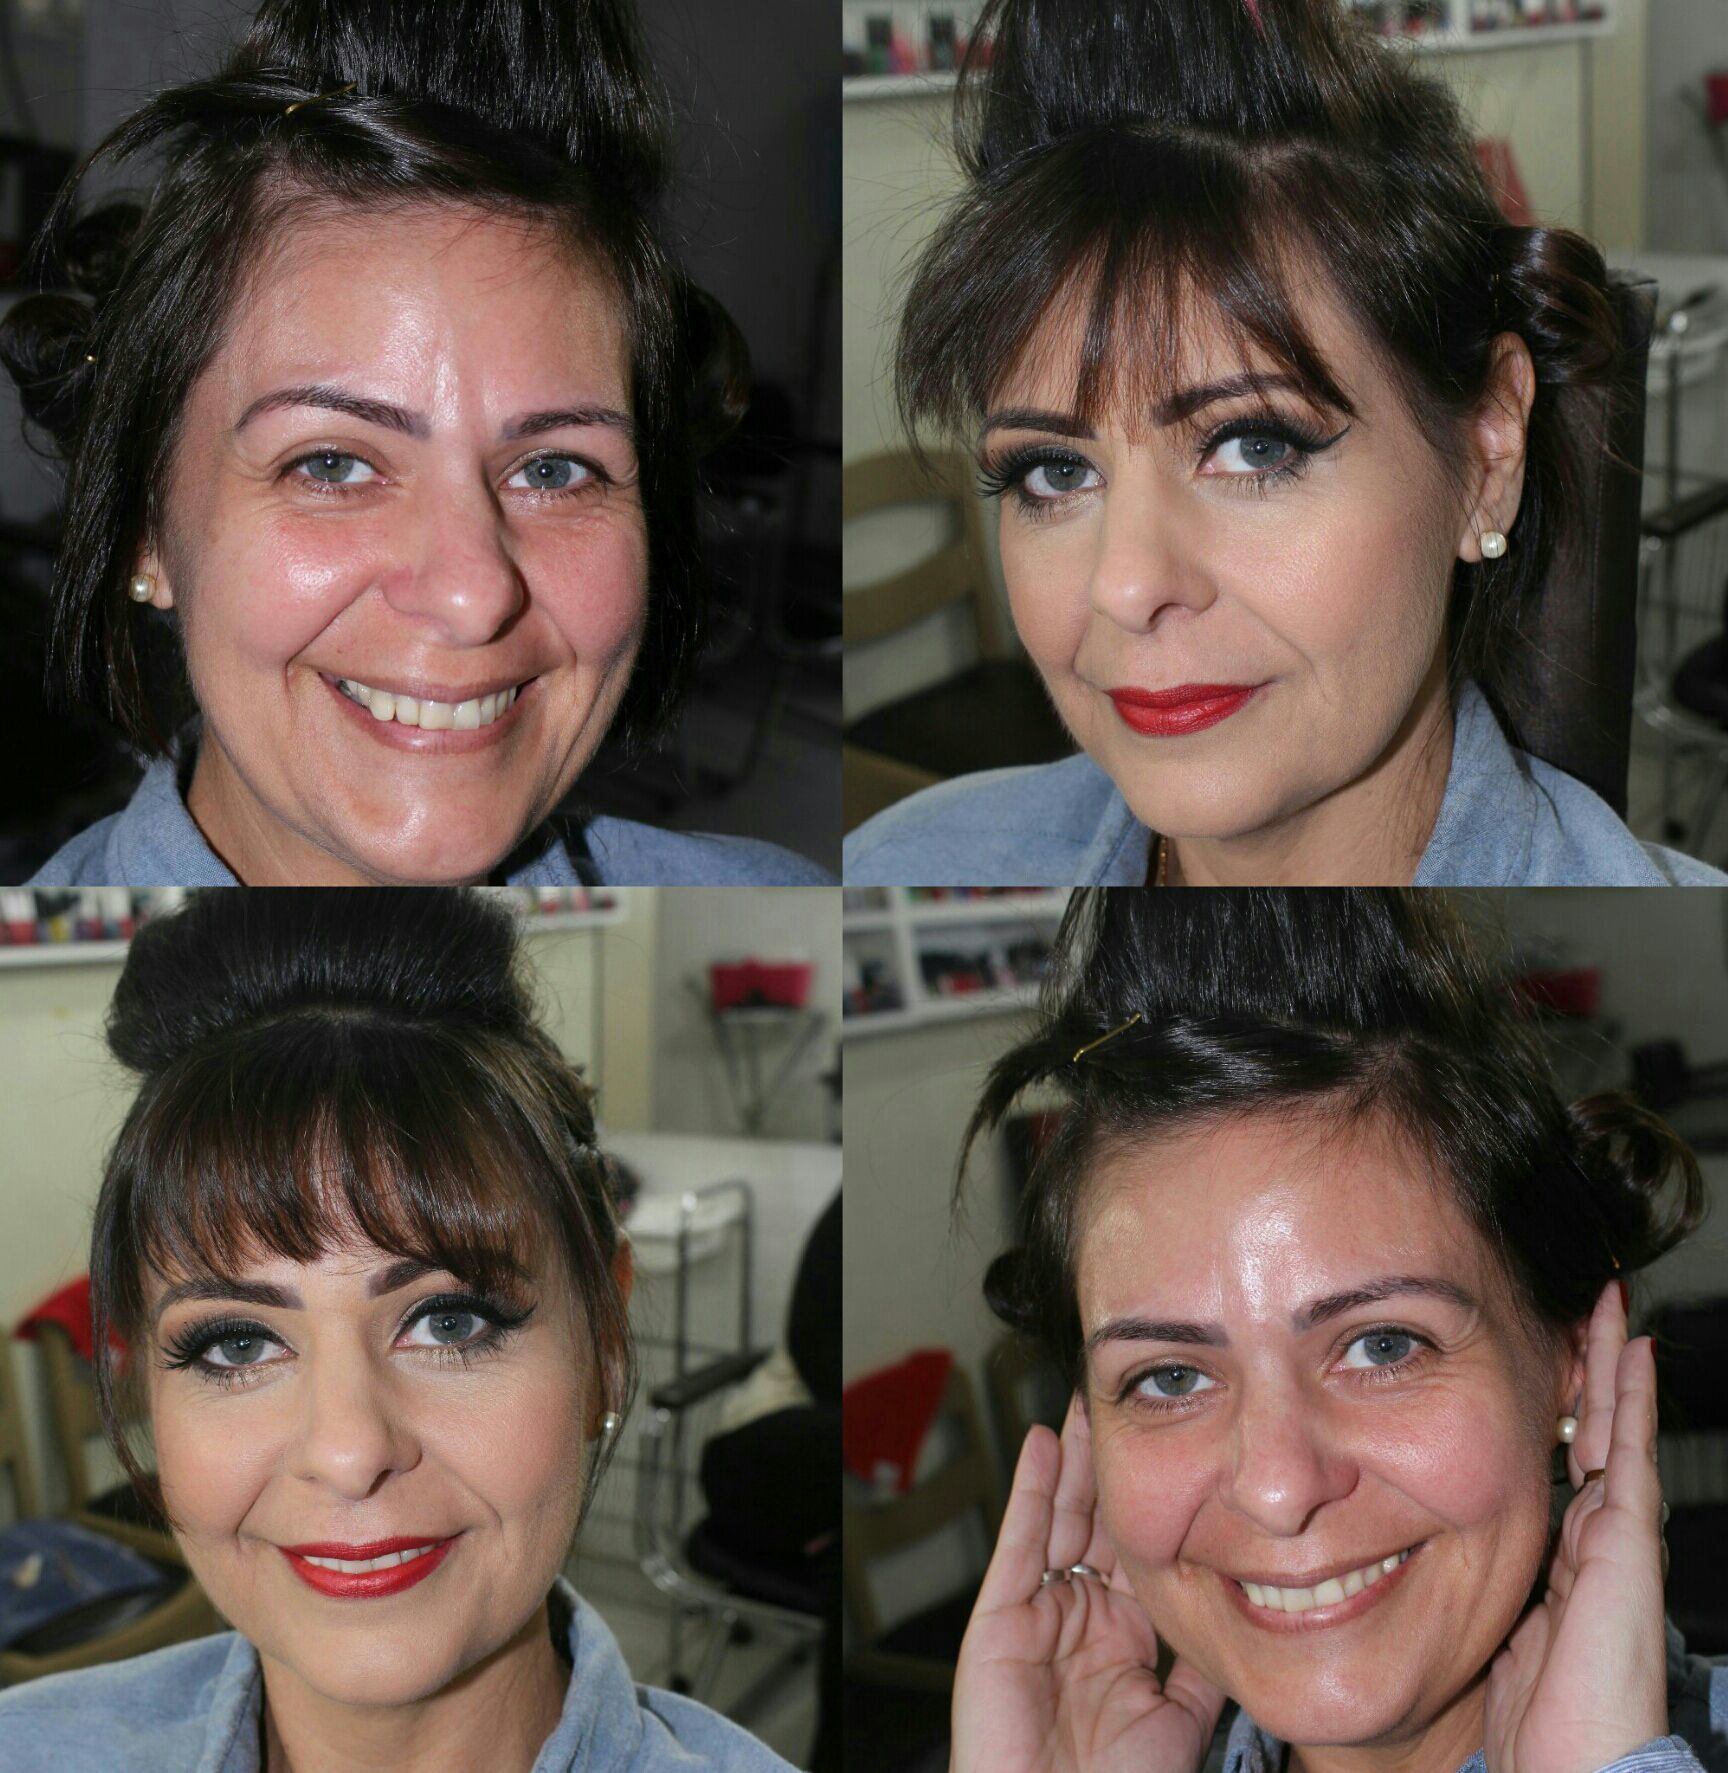 #makeup #maquiagemx #maquiagem #makeupBrasil #makeupartistic #afterbefore #Antes&Depois #treinandoMake #makeuppelemadura #makepelomadura maquiagem maquiador(a) esteticista manicure e pedicure designer de sobrancelhas